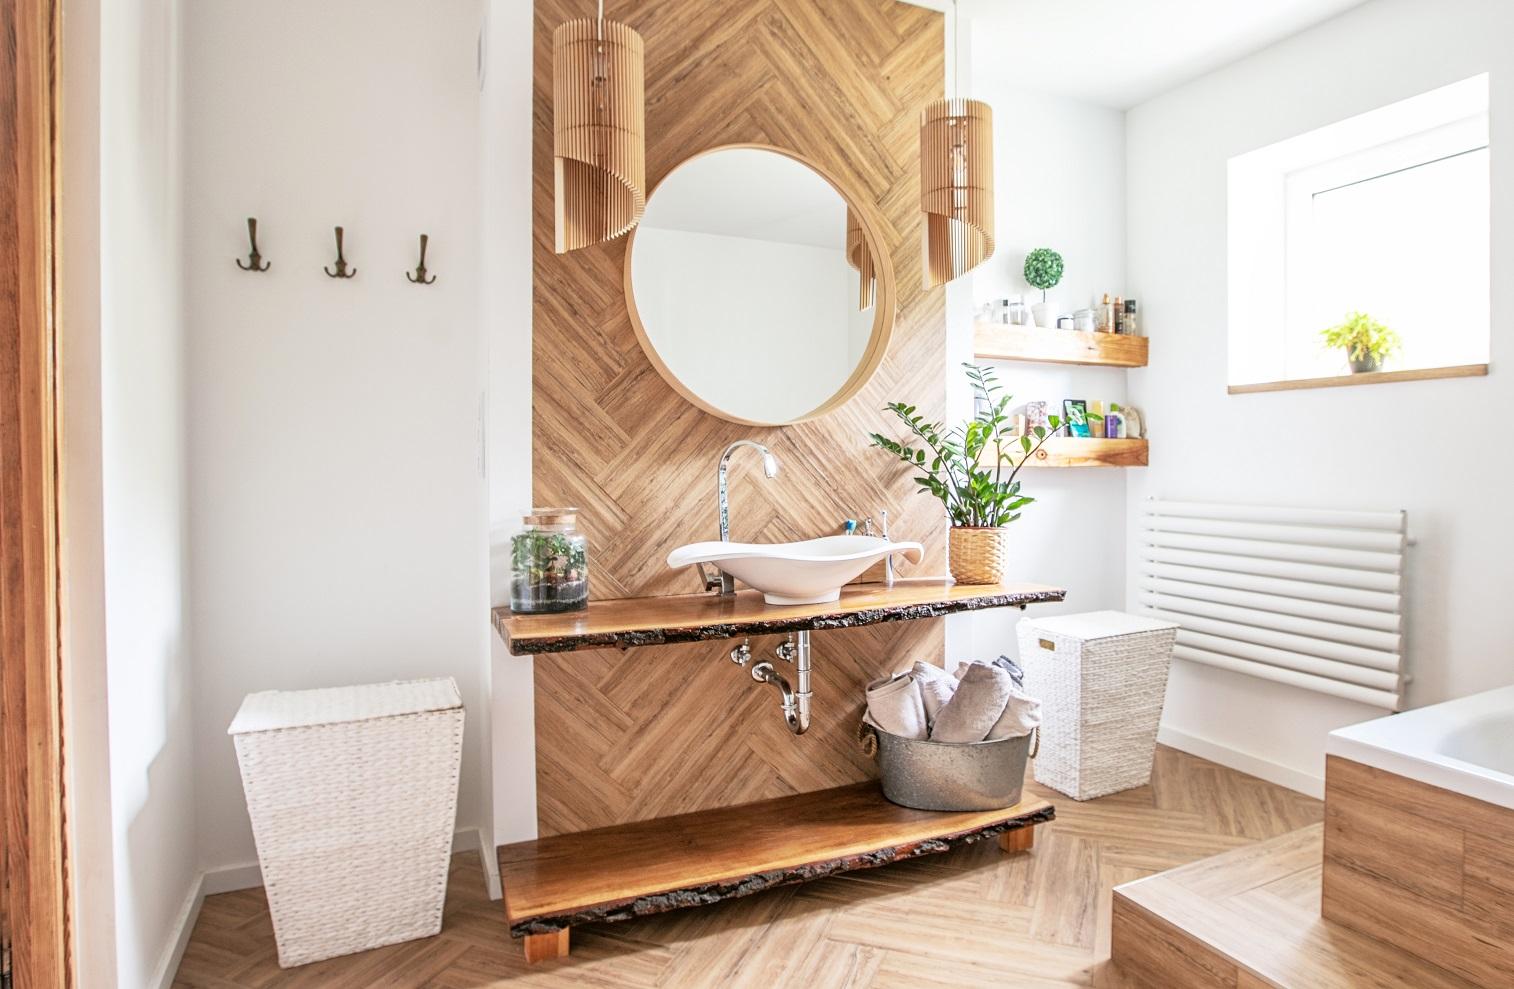 Meubles bois salle de bain